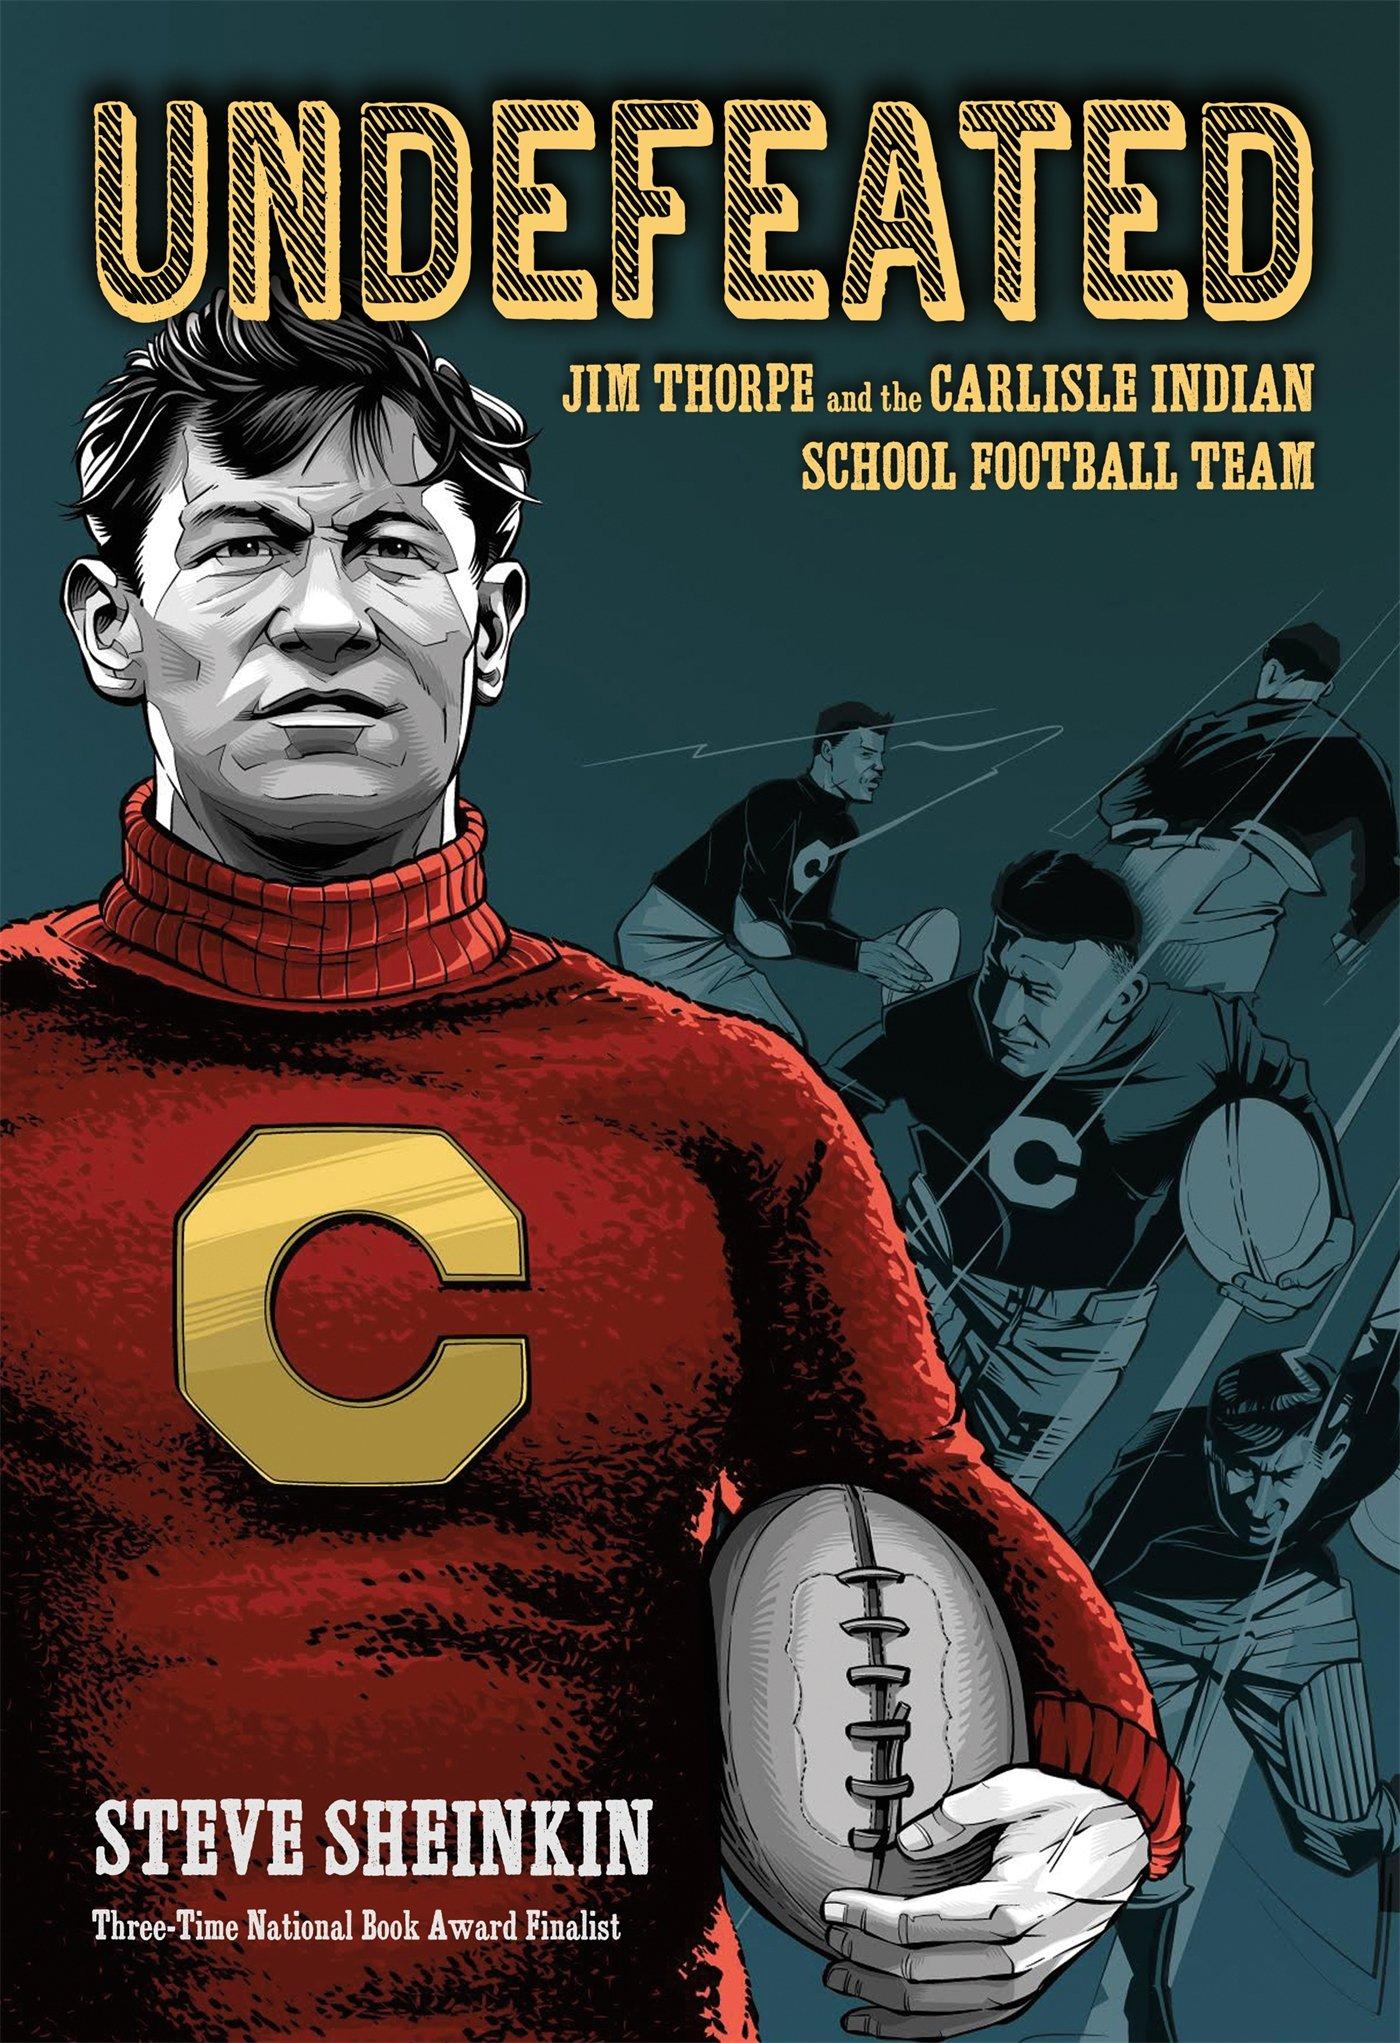 Amazon.com: Undefeated: Jim Thorpe and the Carlisle Indian School Football  Team: 9781596439542: Sheinkin, Steve: Books